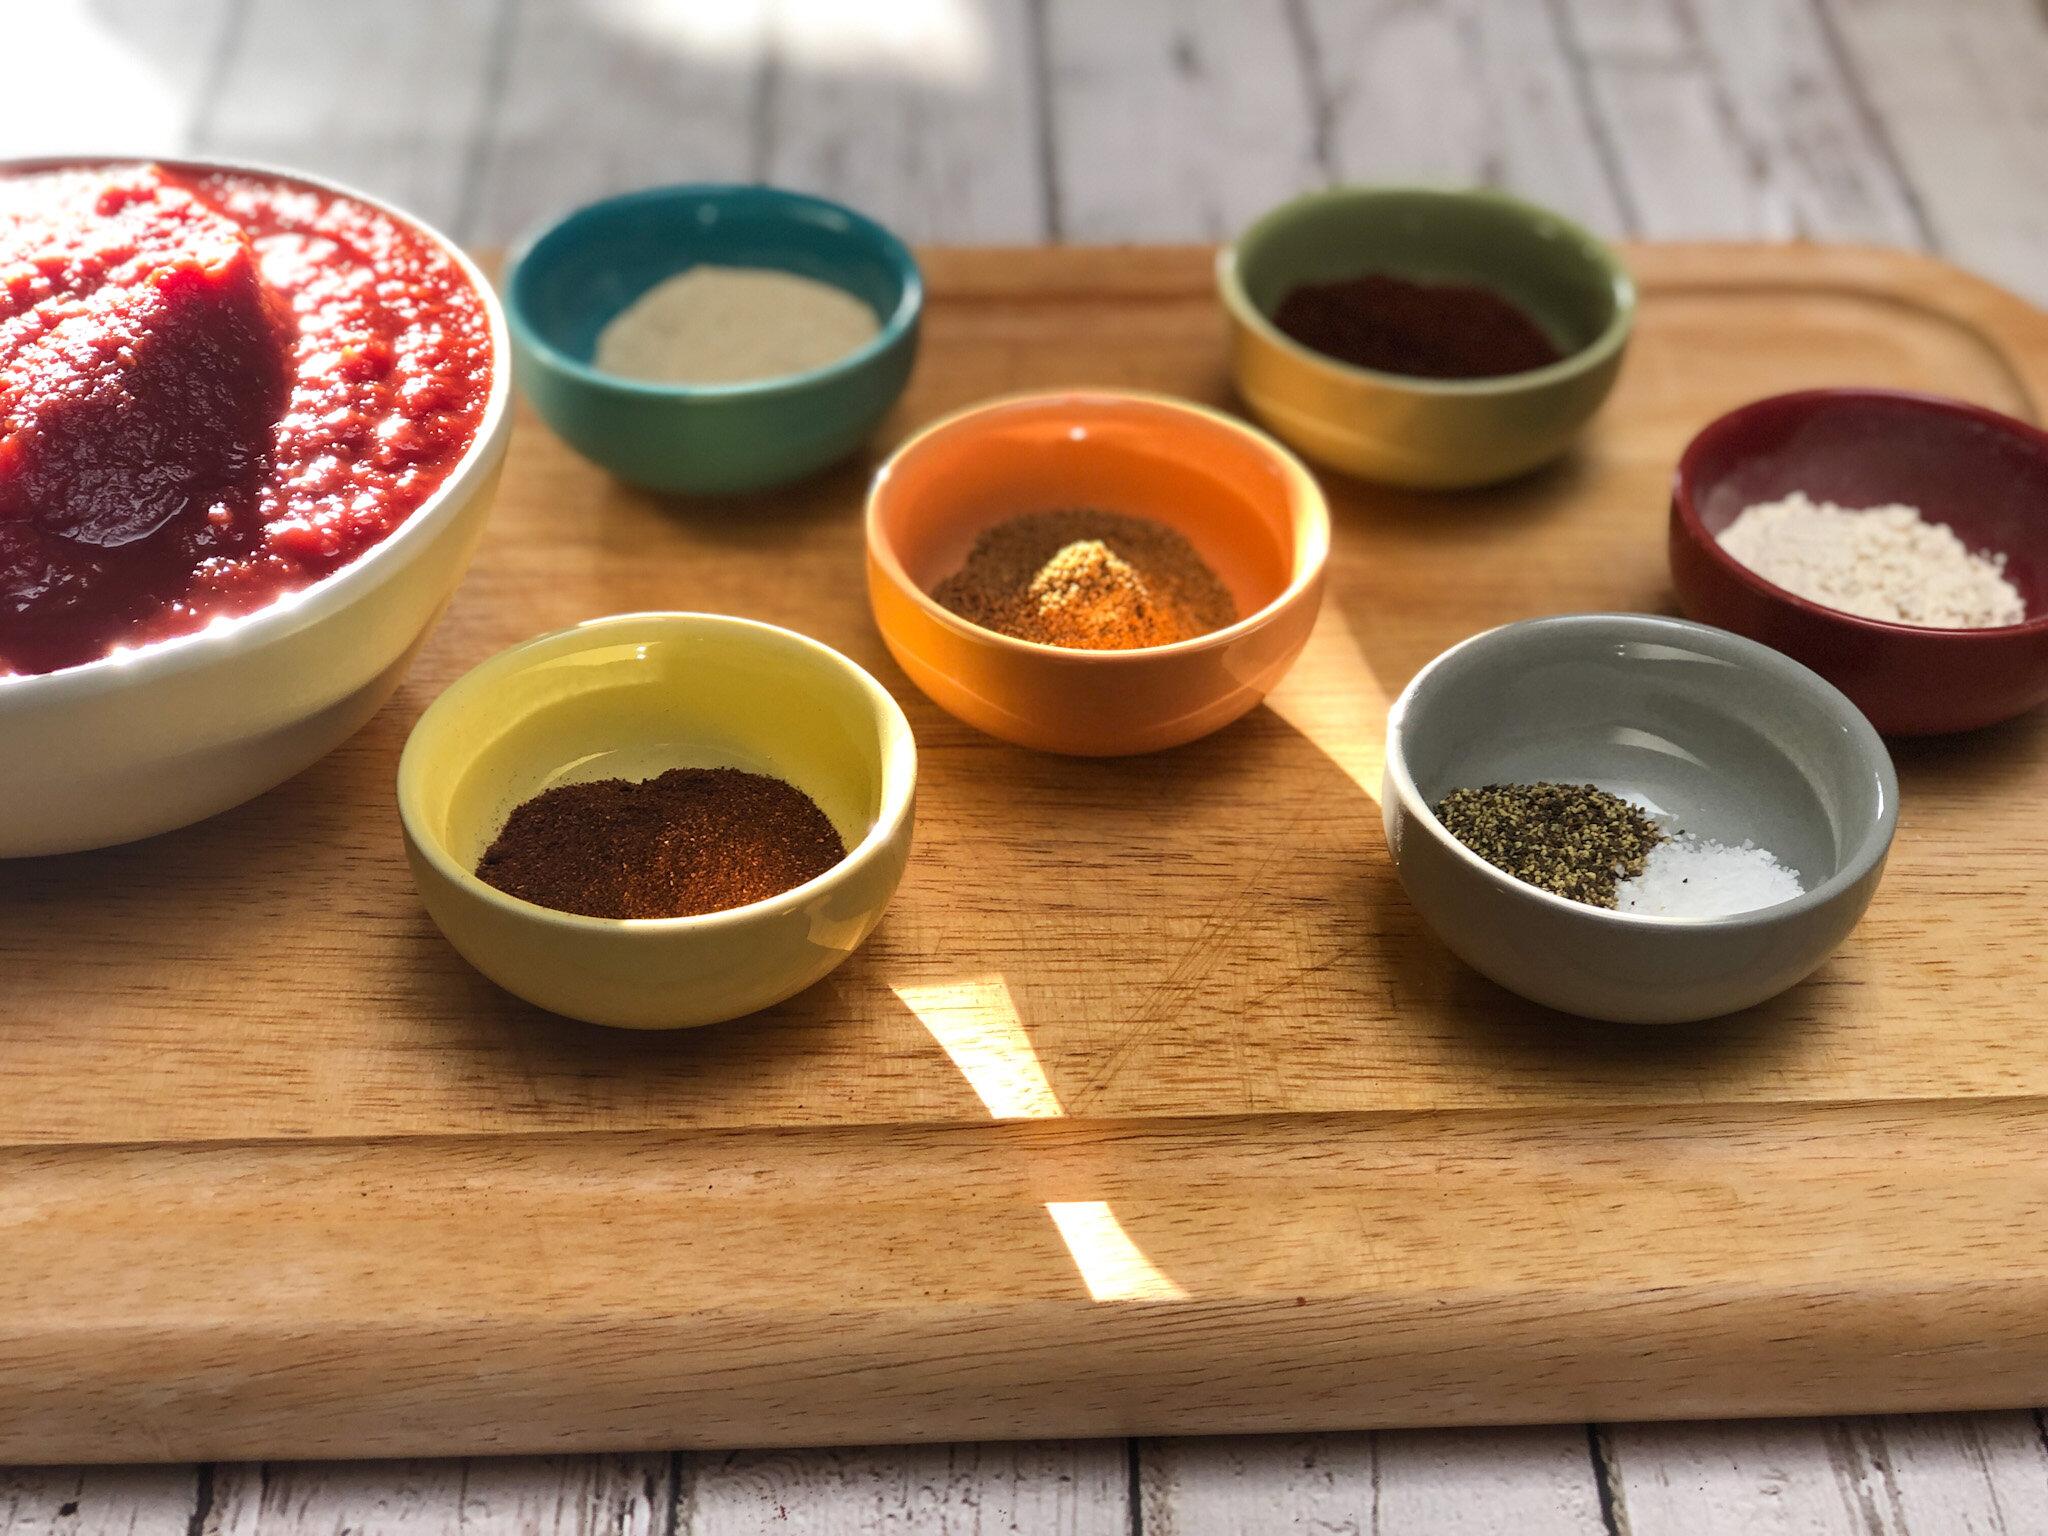 Seasonings for Heart-Healthy Turkey Chili